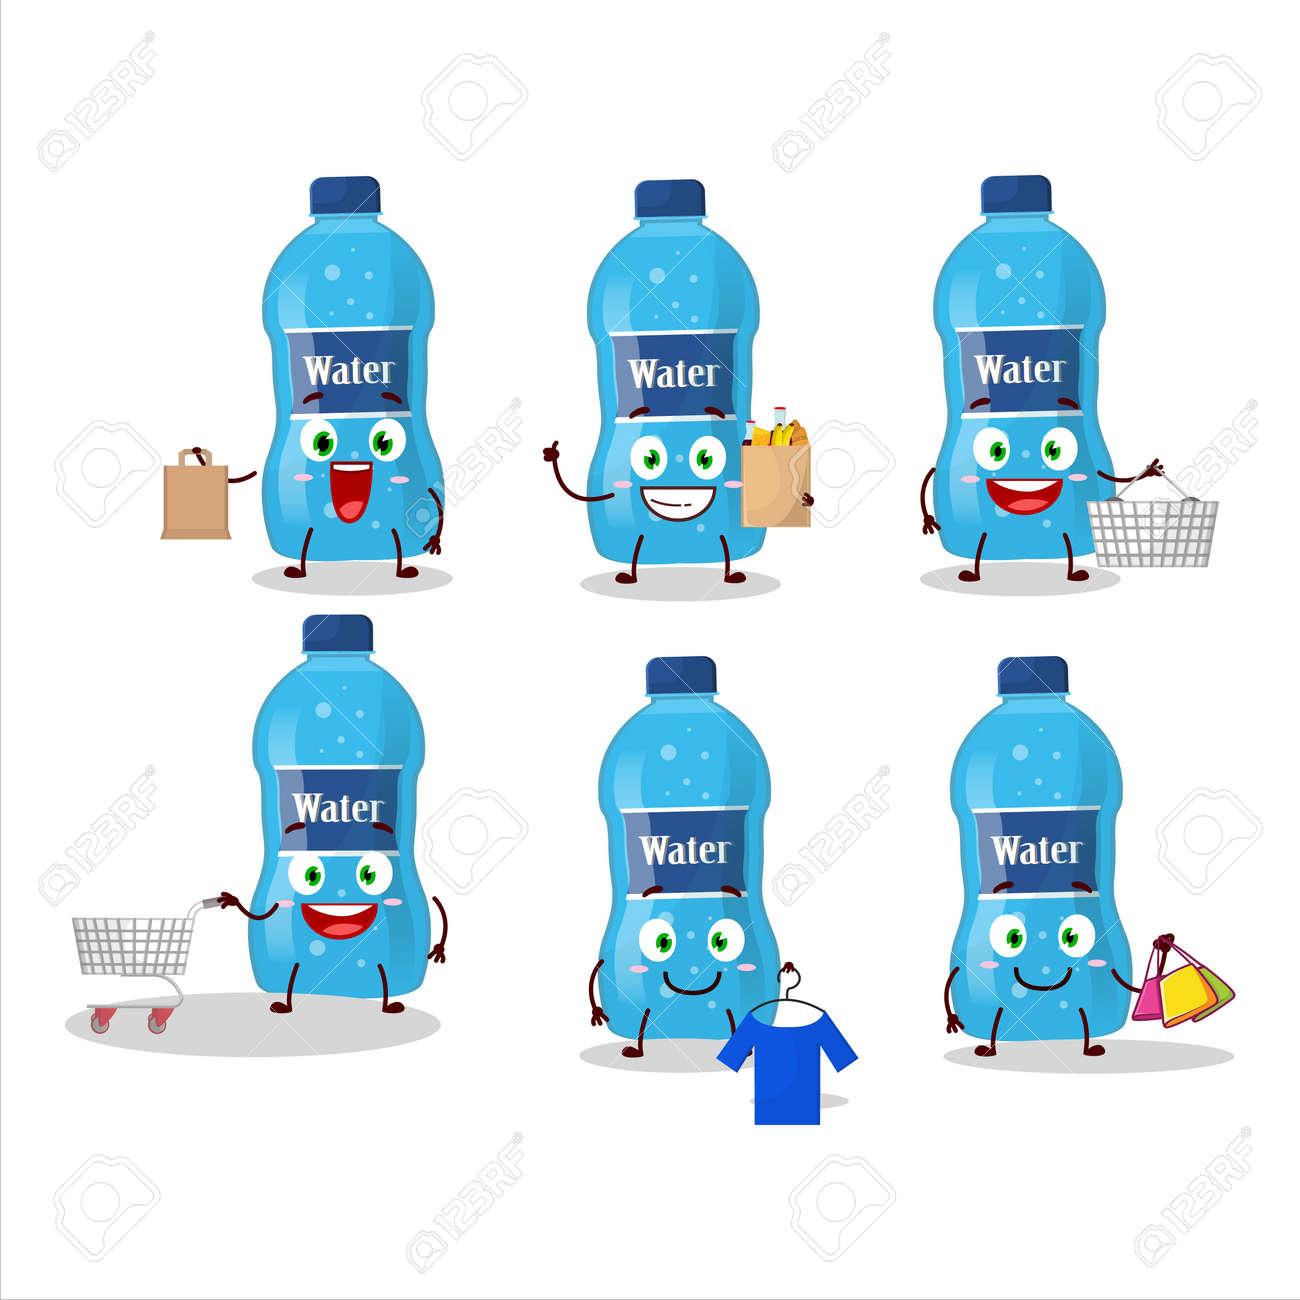 A Rich water bottle mascot design style going shopping - 172515415